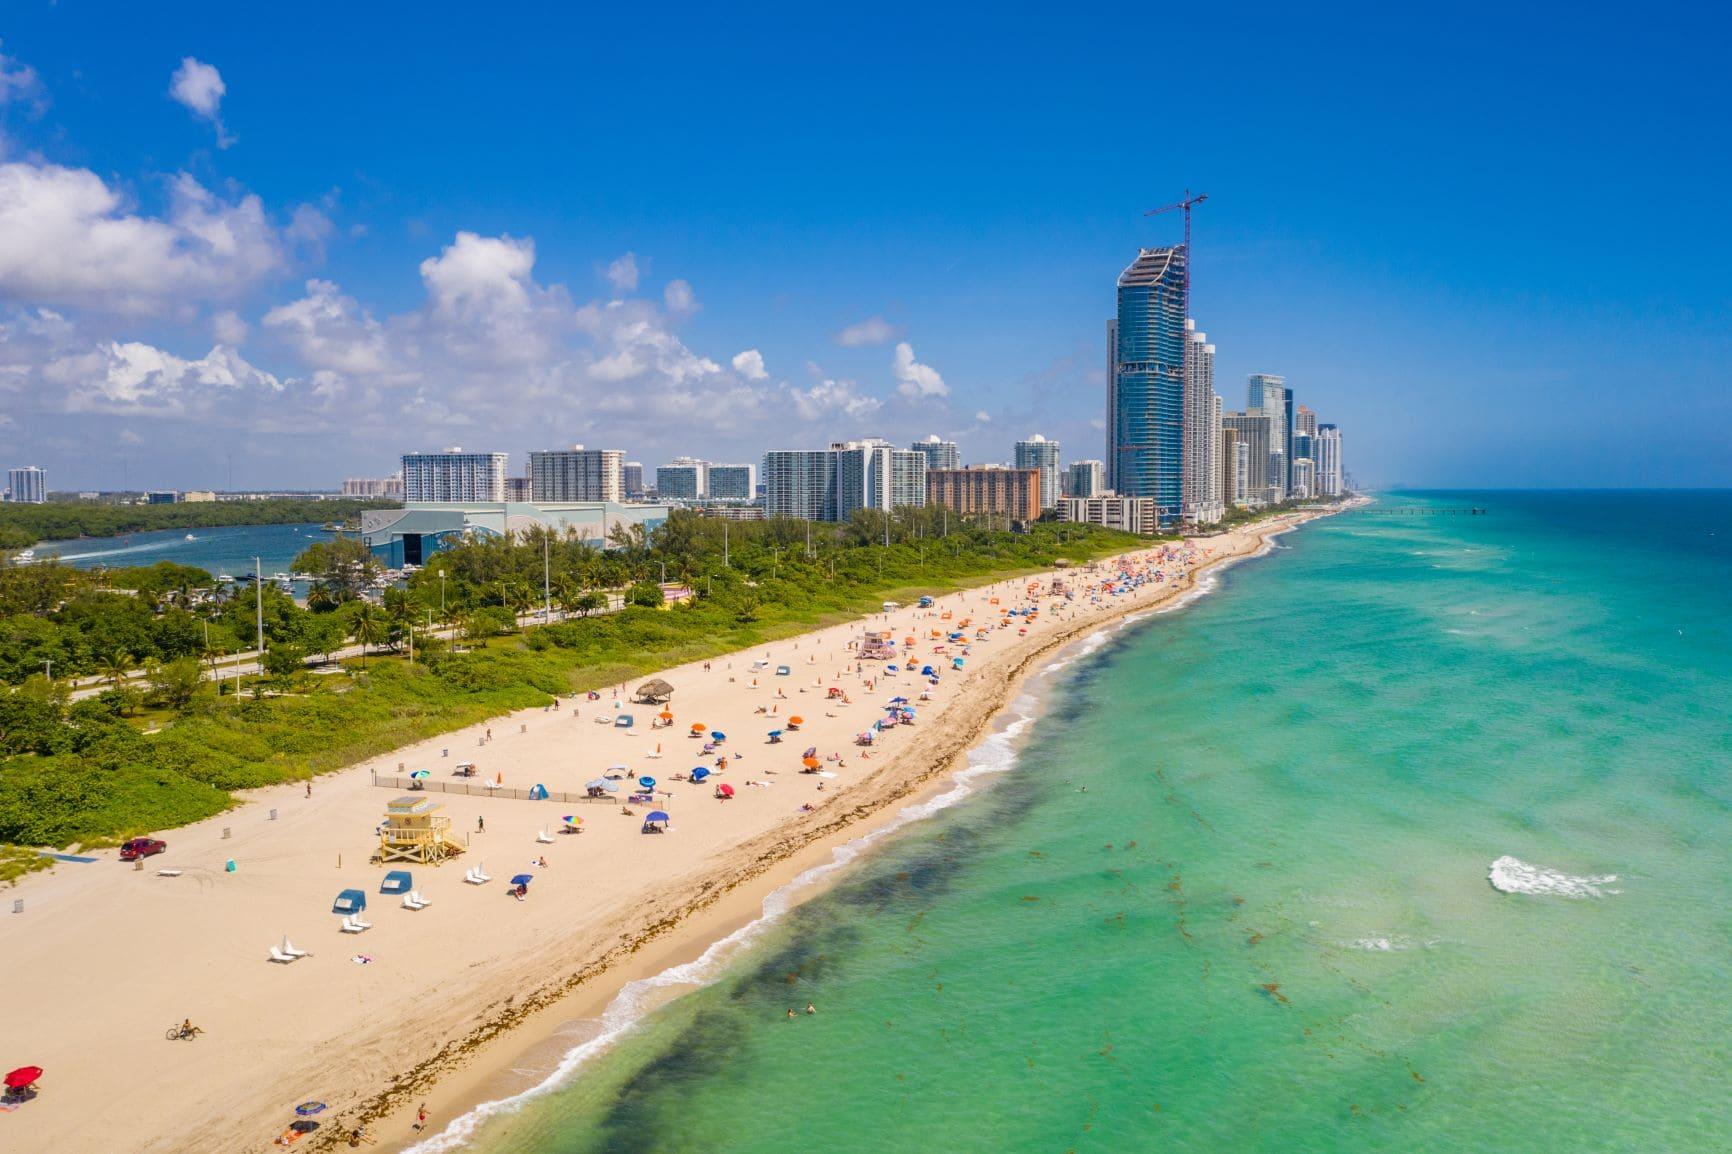 Haulover Park Beach in Miami